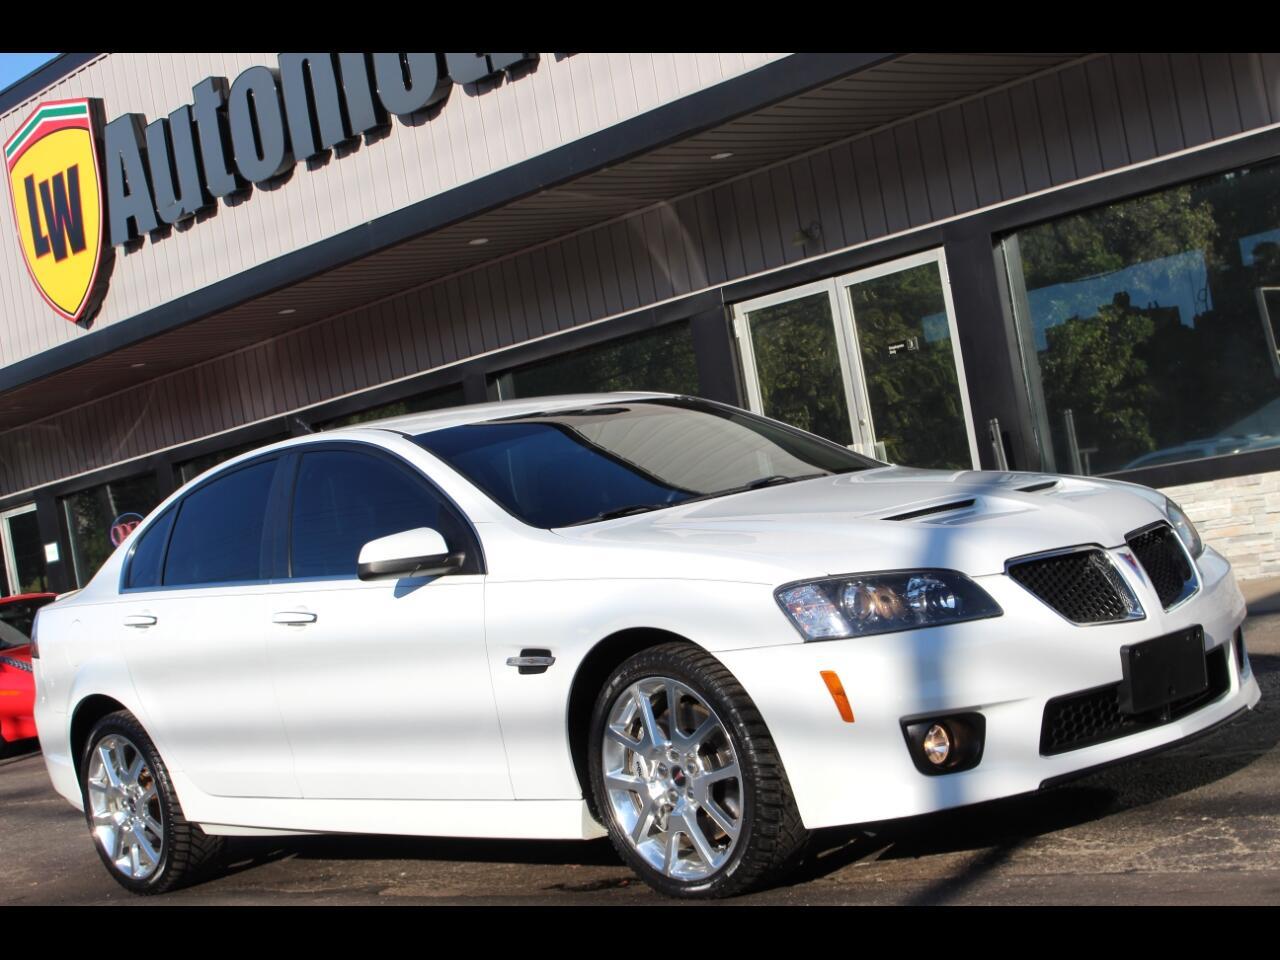 2009 Pontiac G8 4dr Sdn GXP